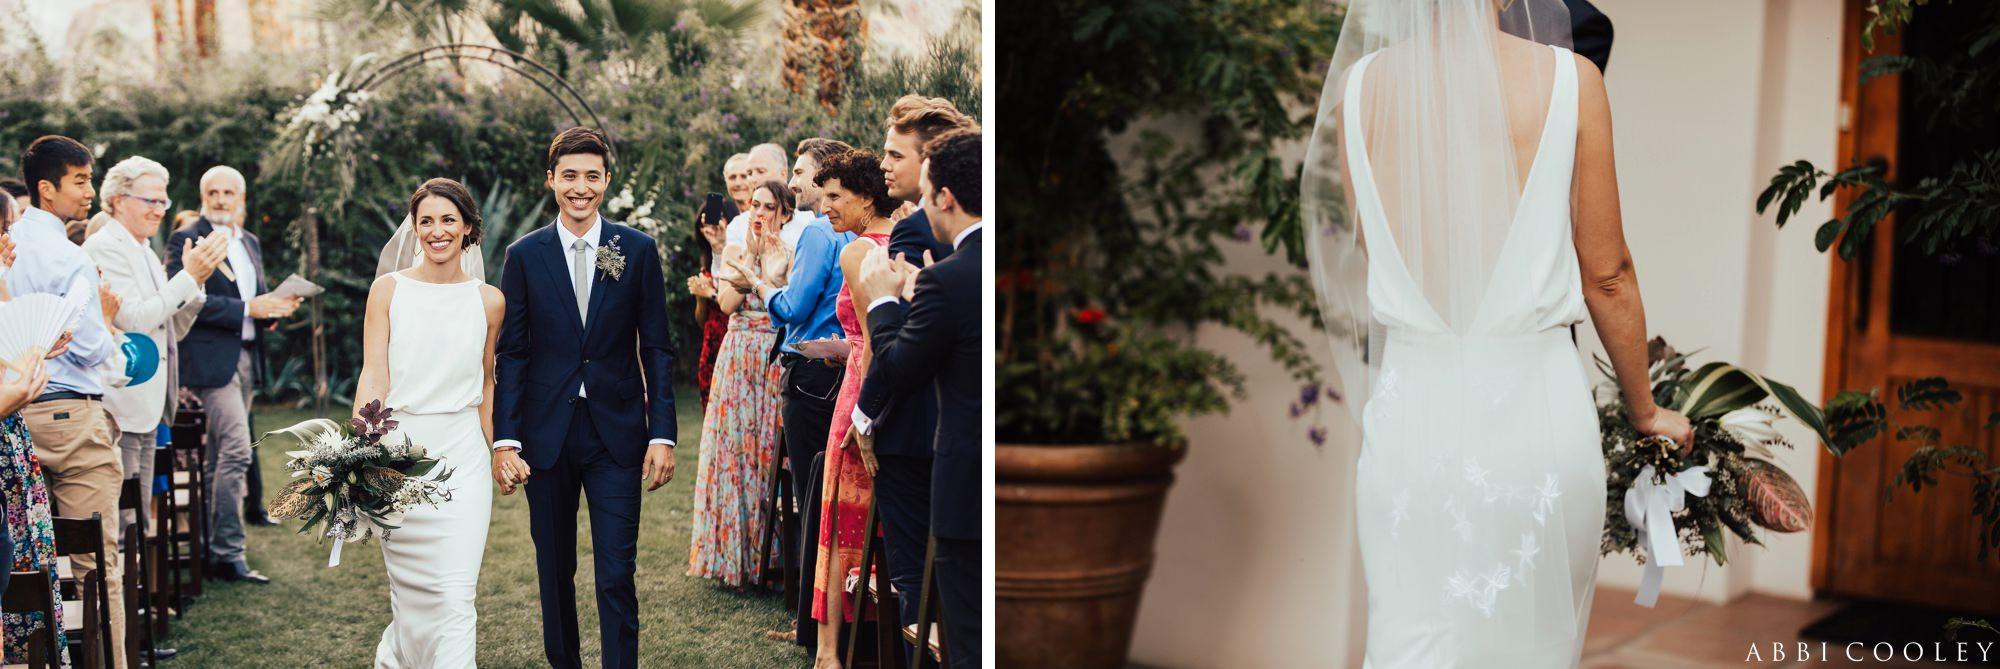 ABBI COOLEY PALM SPRINGS WEDDING_0807